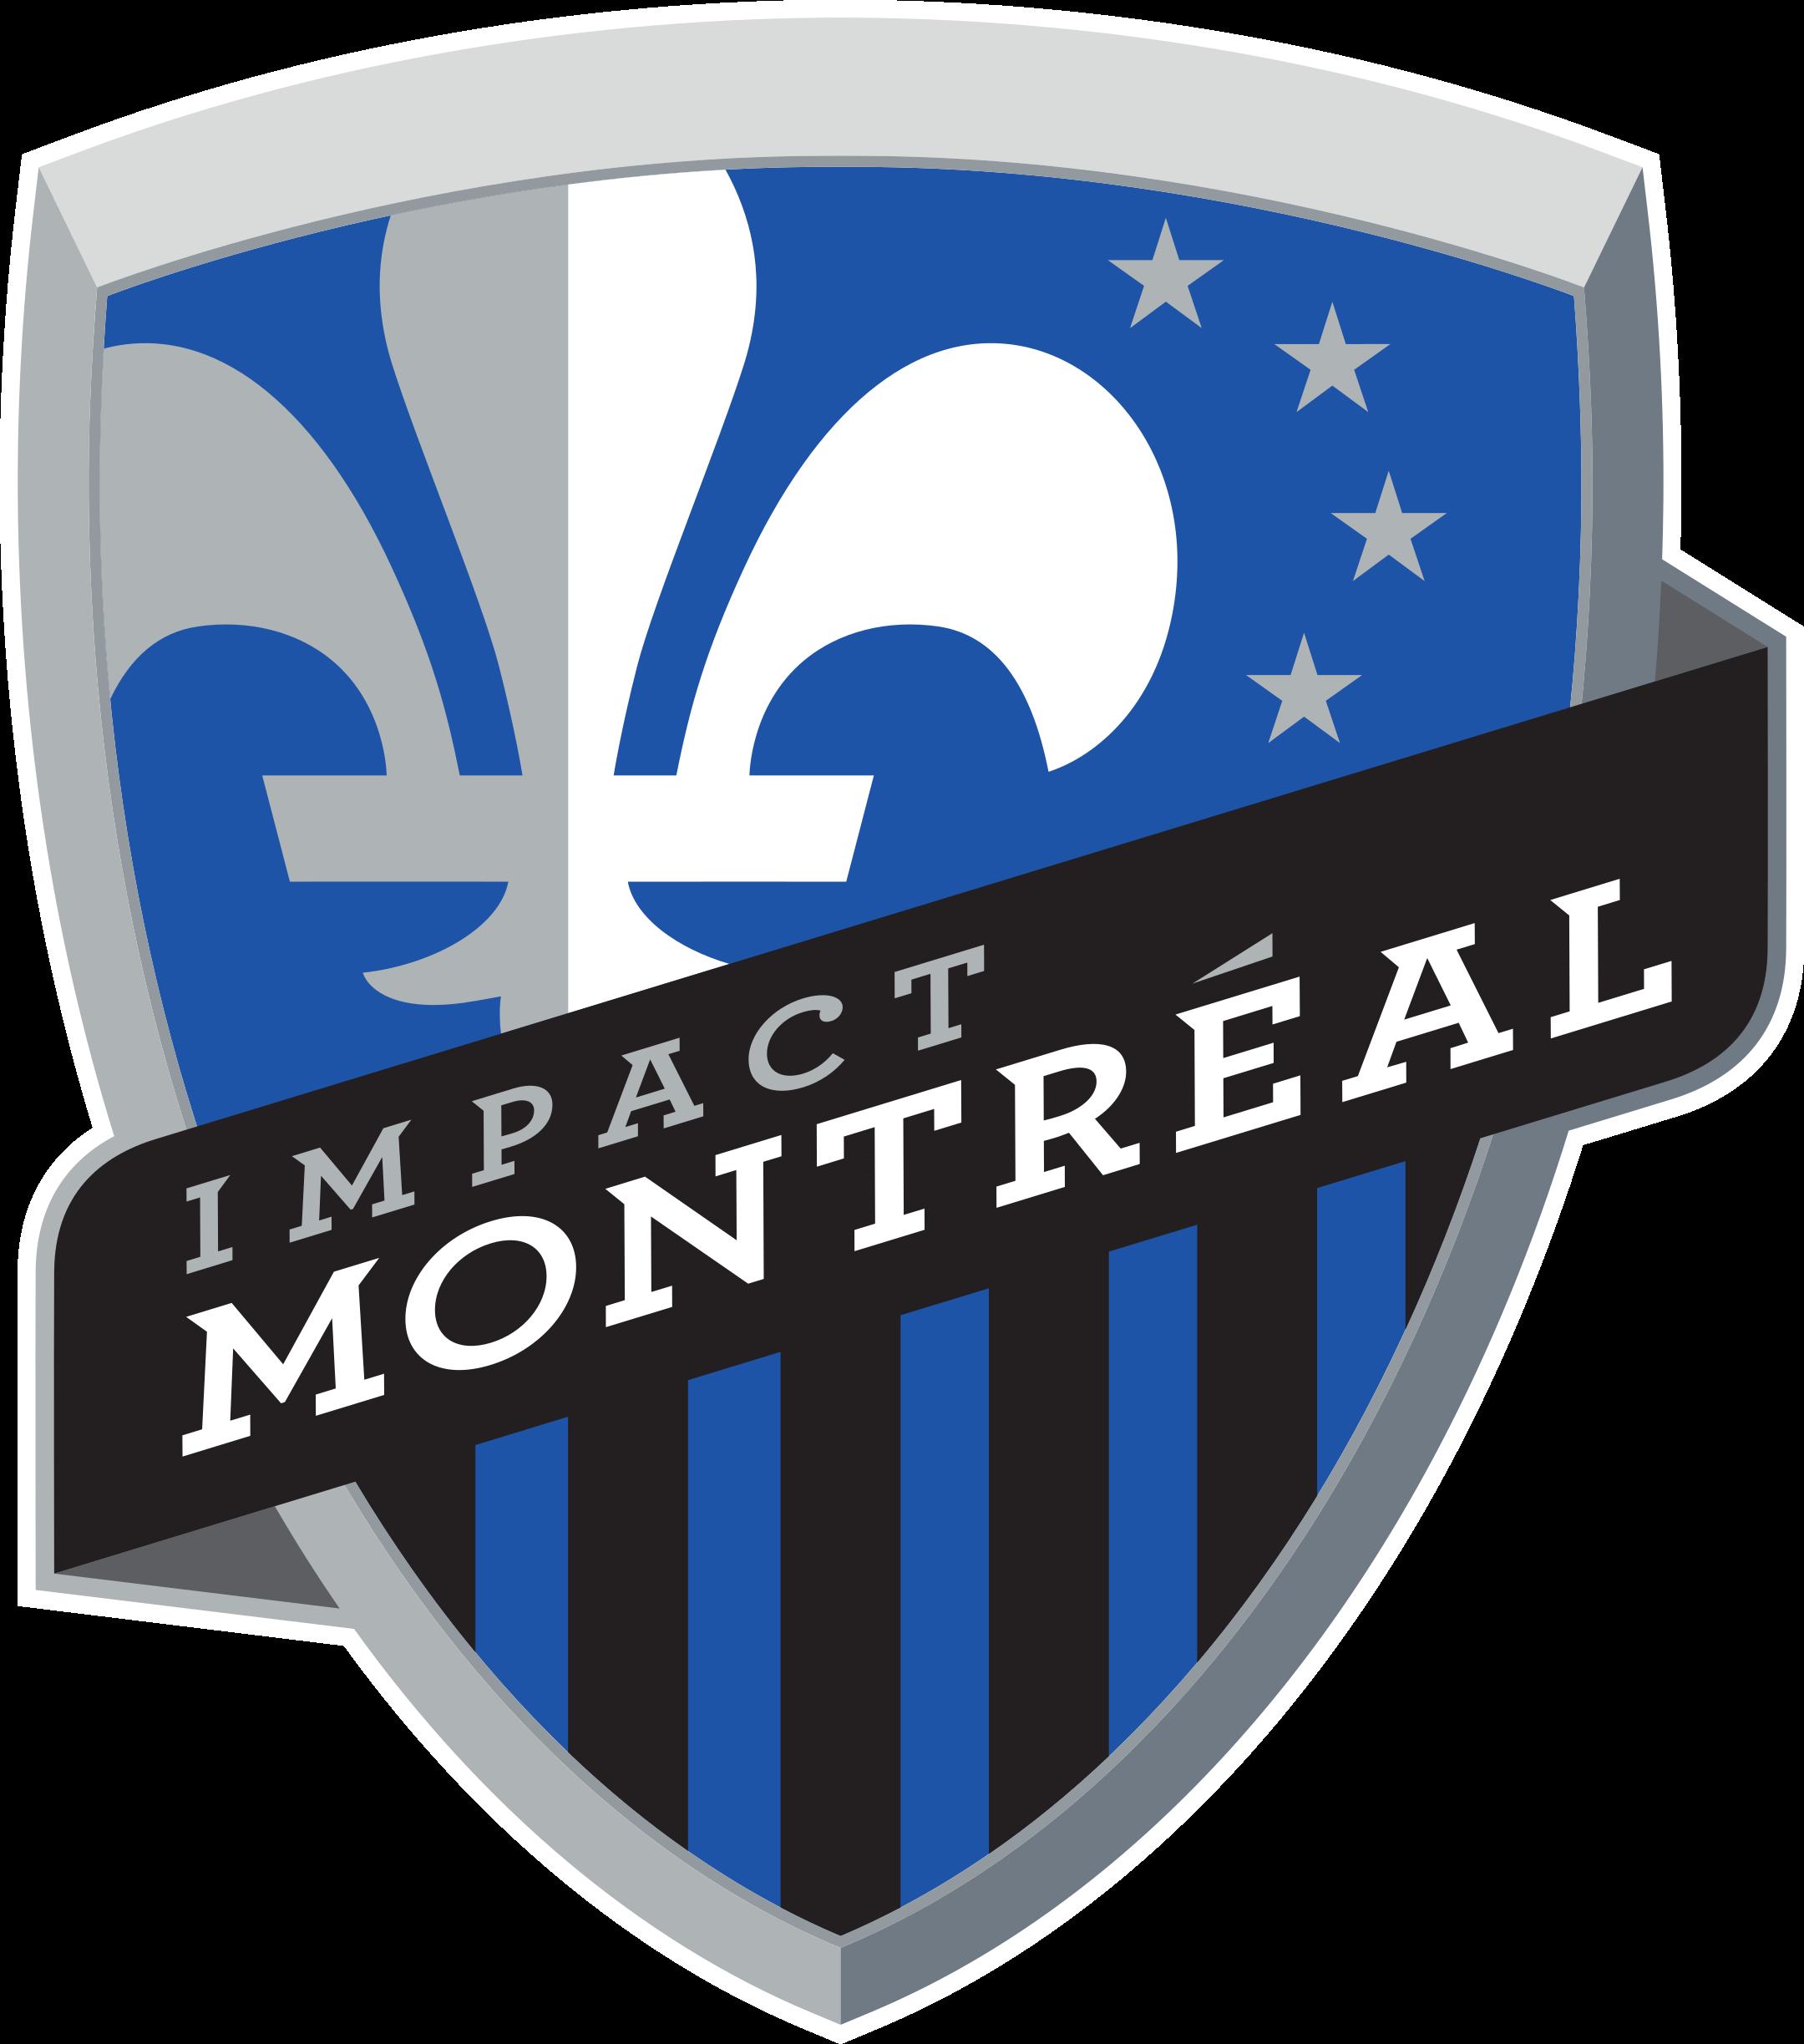 montreal impact logo 1 - Montreal Impact Logo